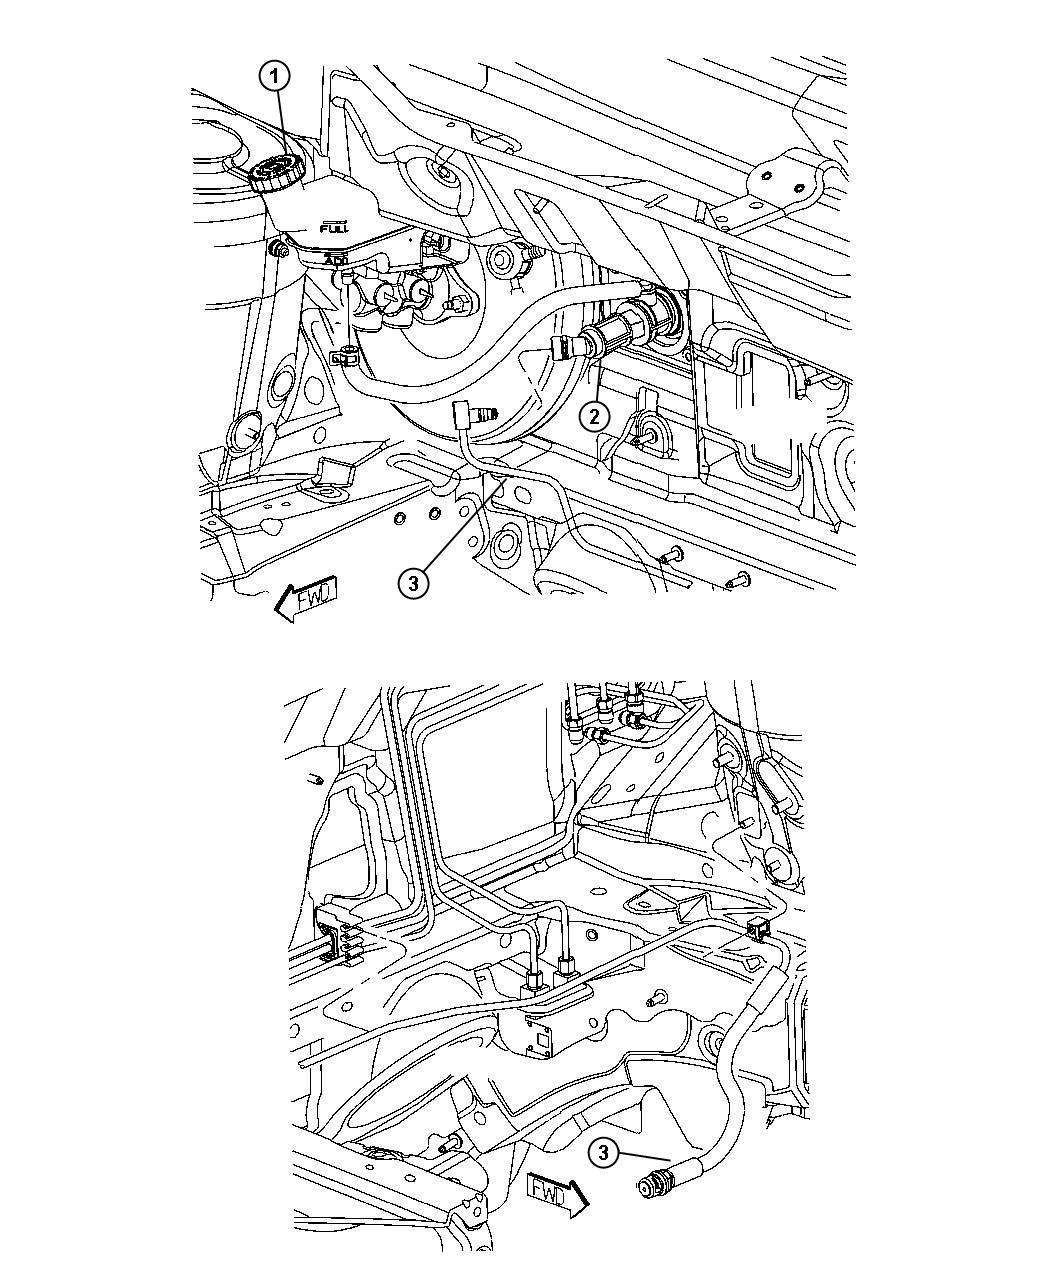 Dodge Caliber Actuator. Hydraulic clutch. Fwd, rwd, pedal